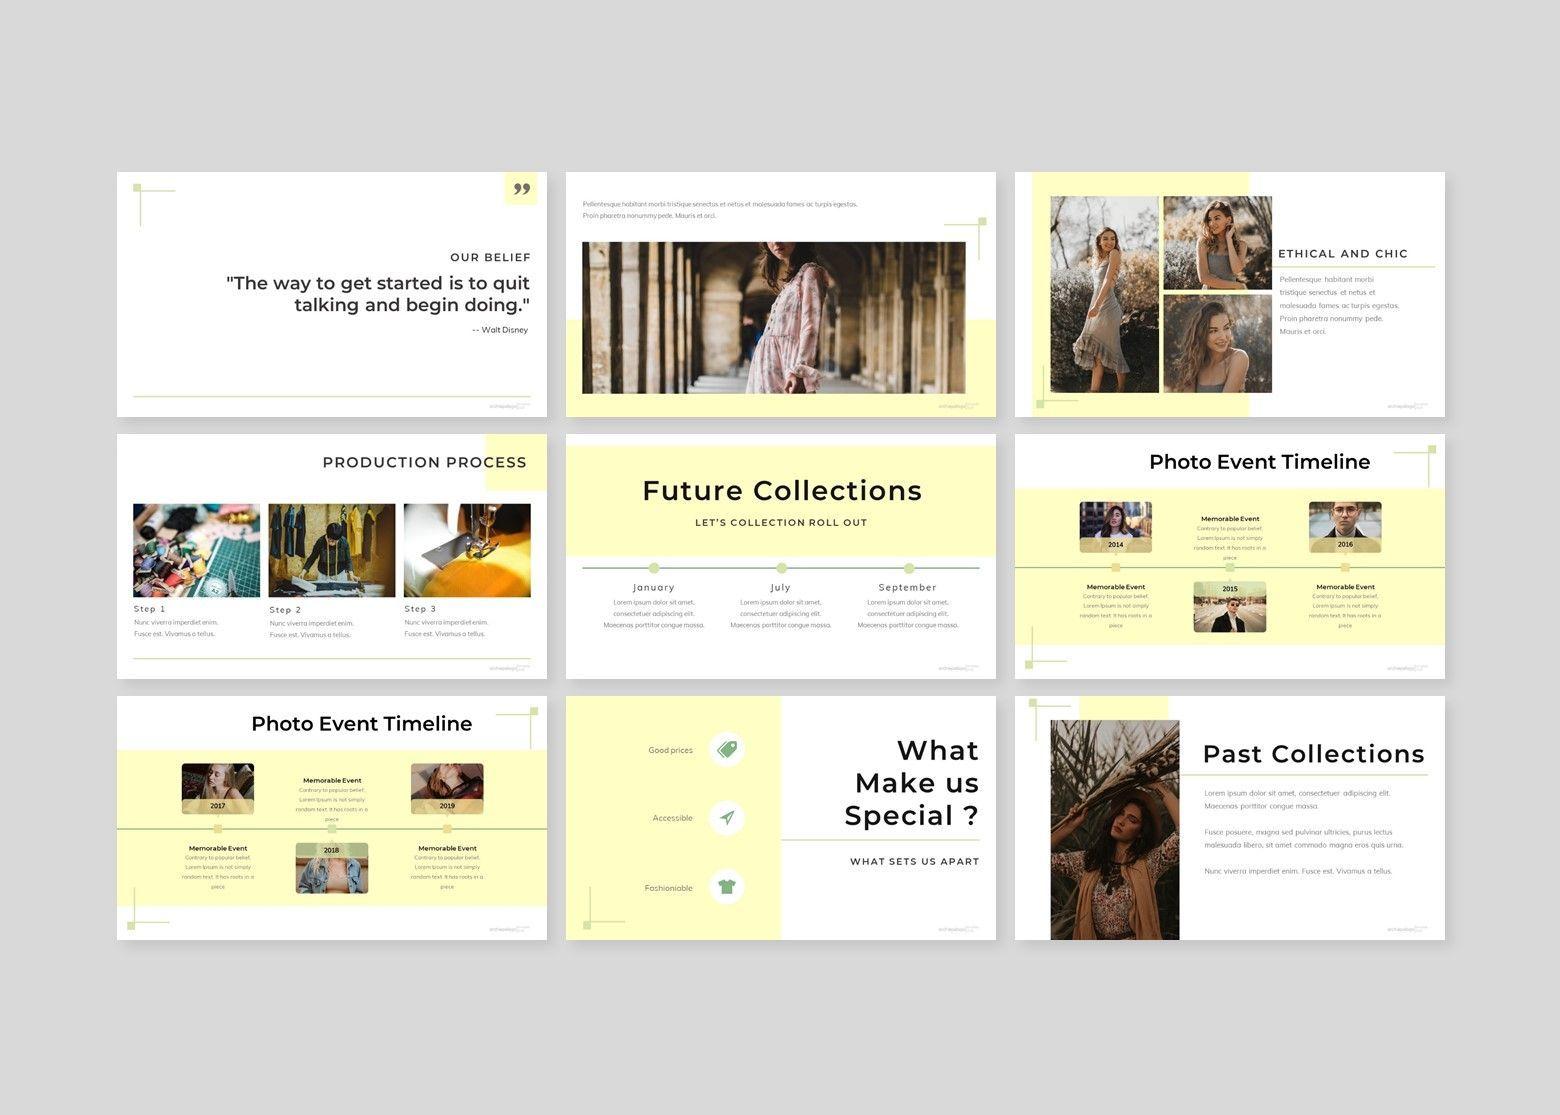 Archiepelago - Powerpoint Template, Slide 3, 07697, Presentation Templates — PoweredTemplate.com